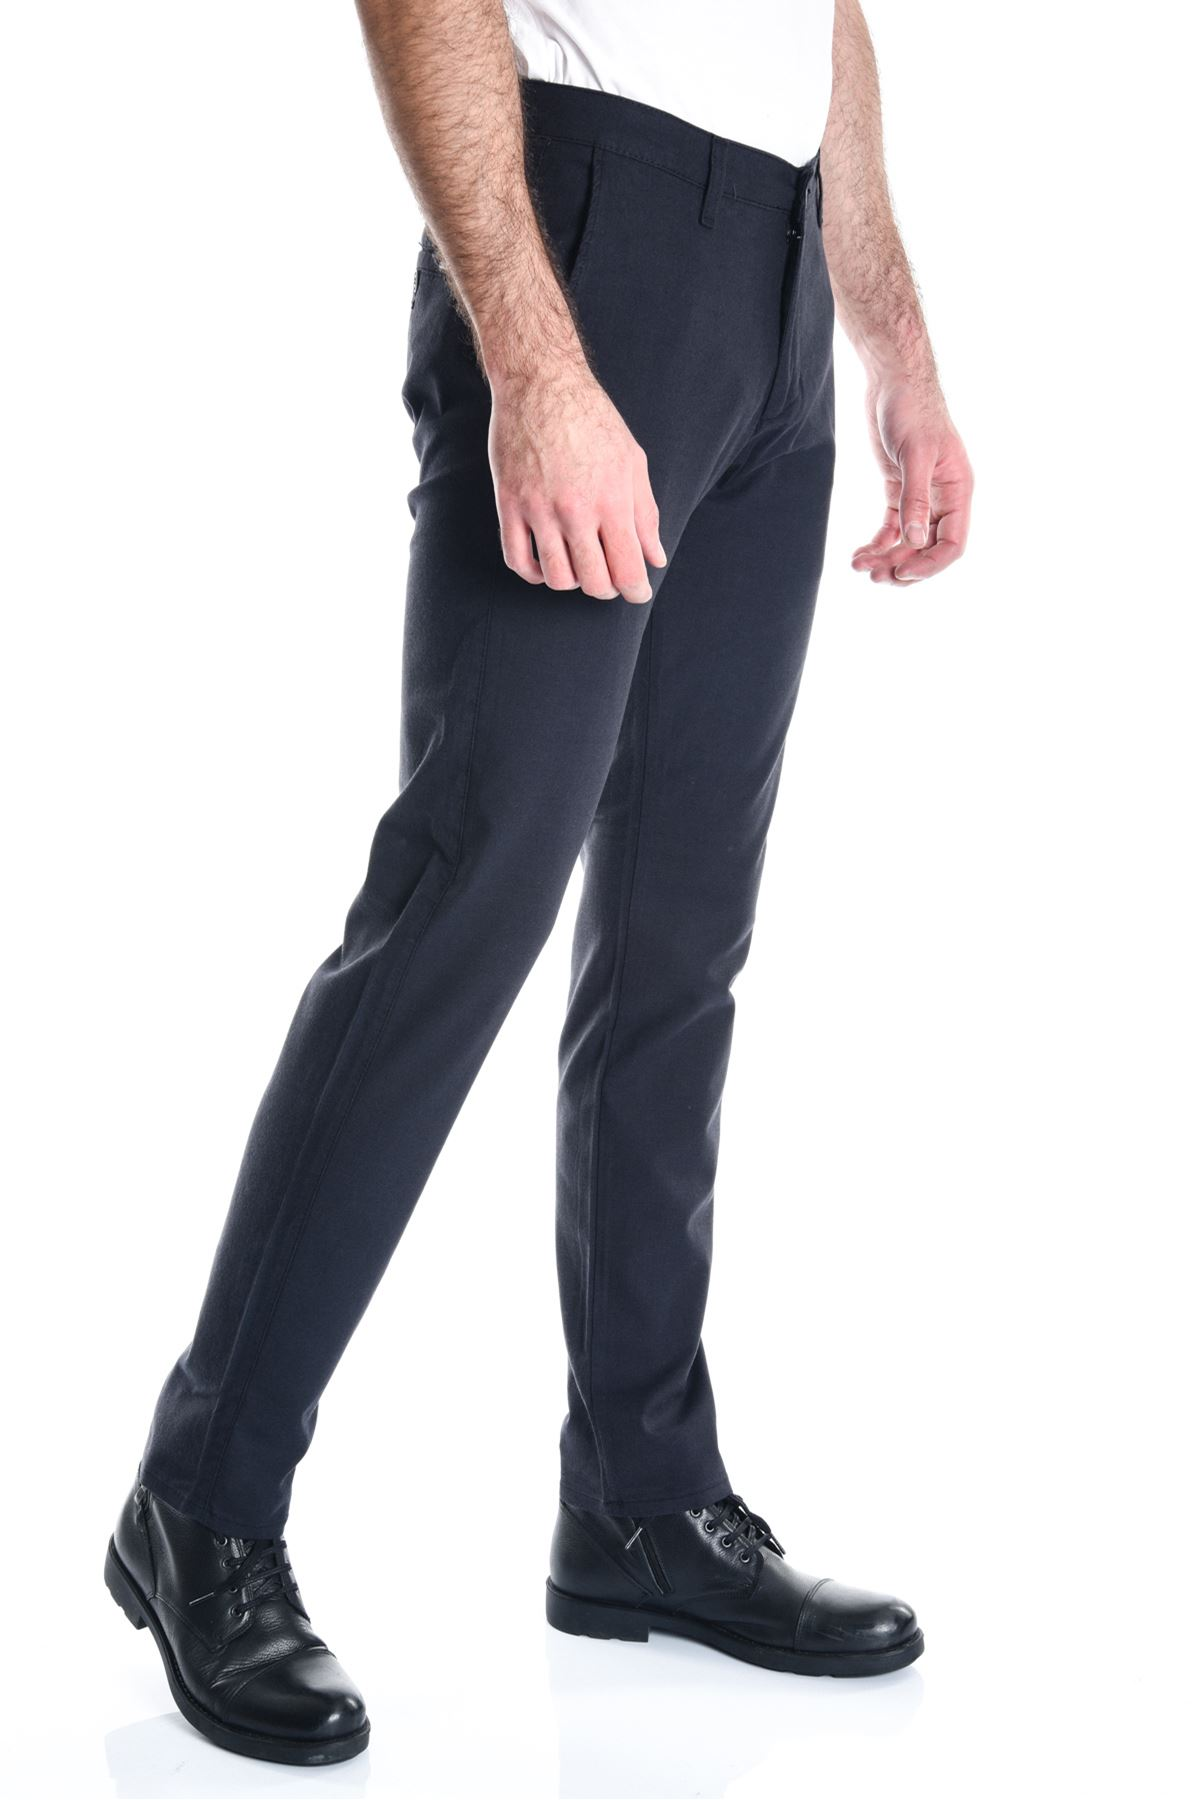 Antrasit Yeni Ekose Slimfit Erkek Chino Pantolon